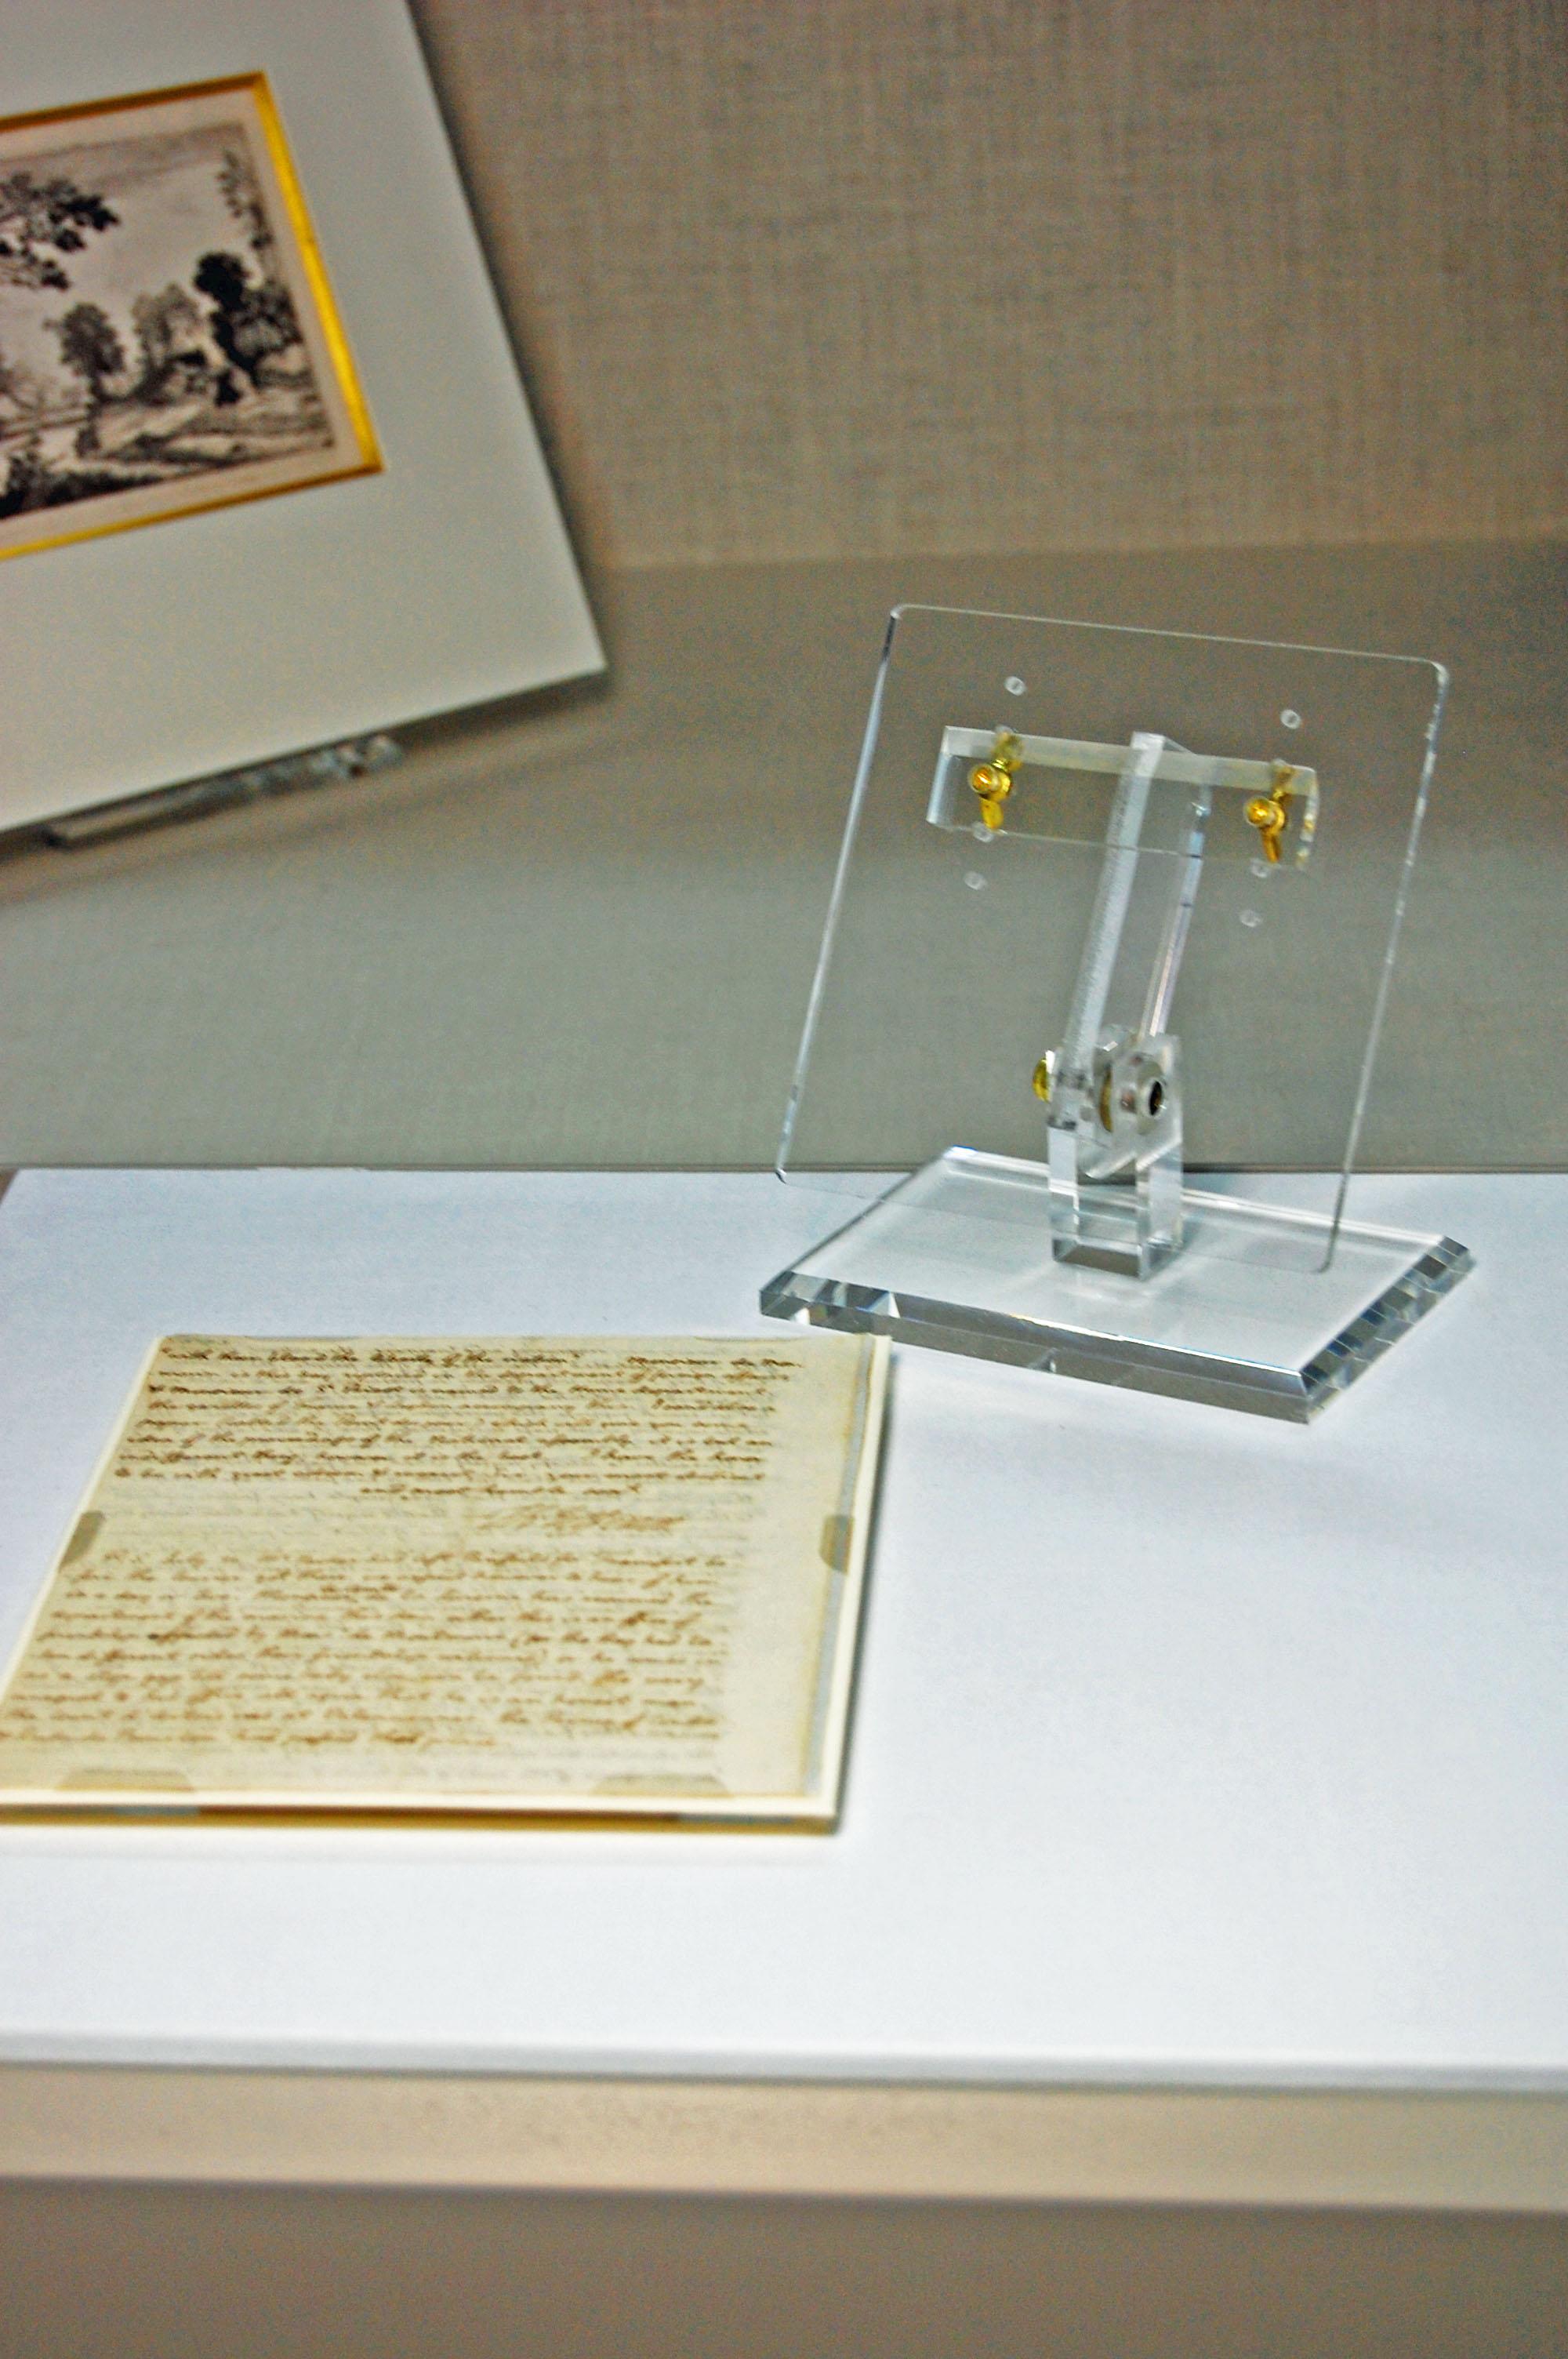 Xibitmount display for documents